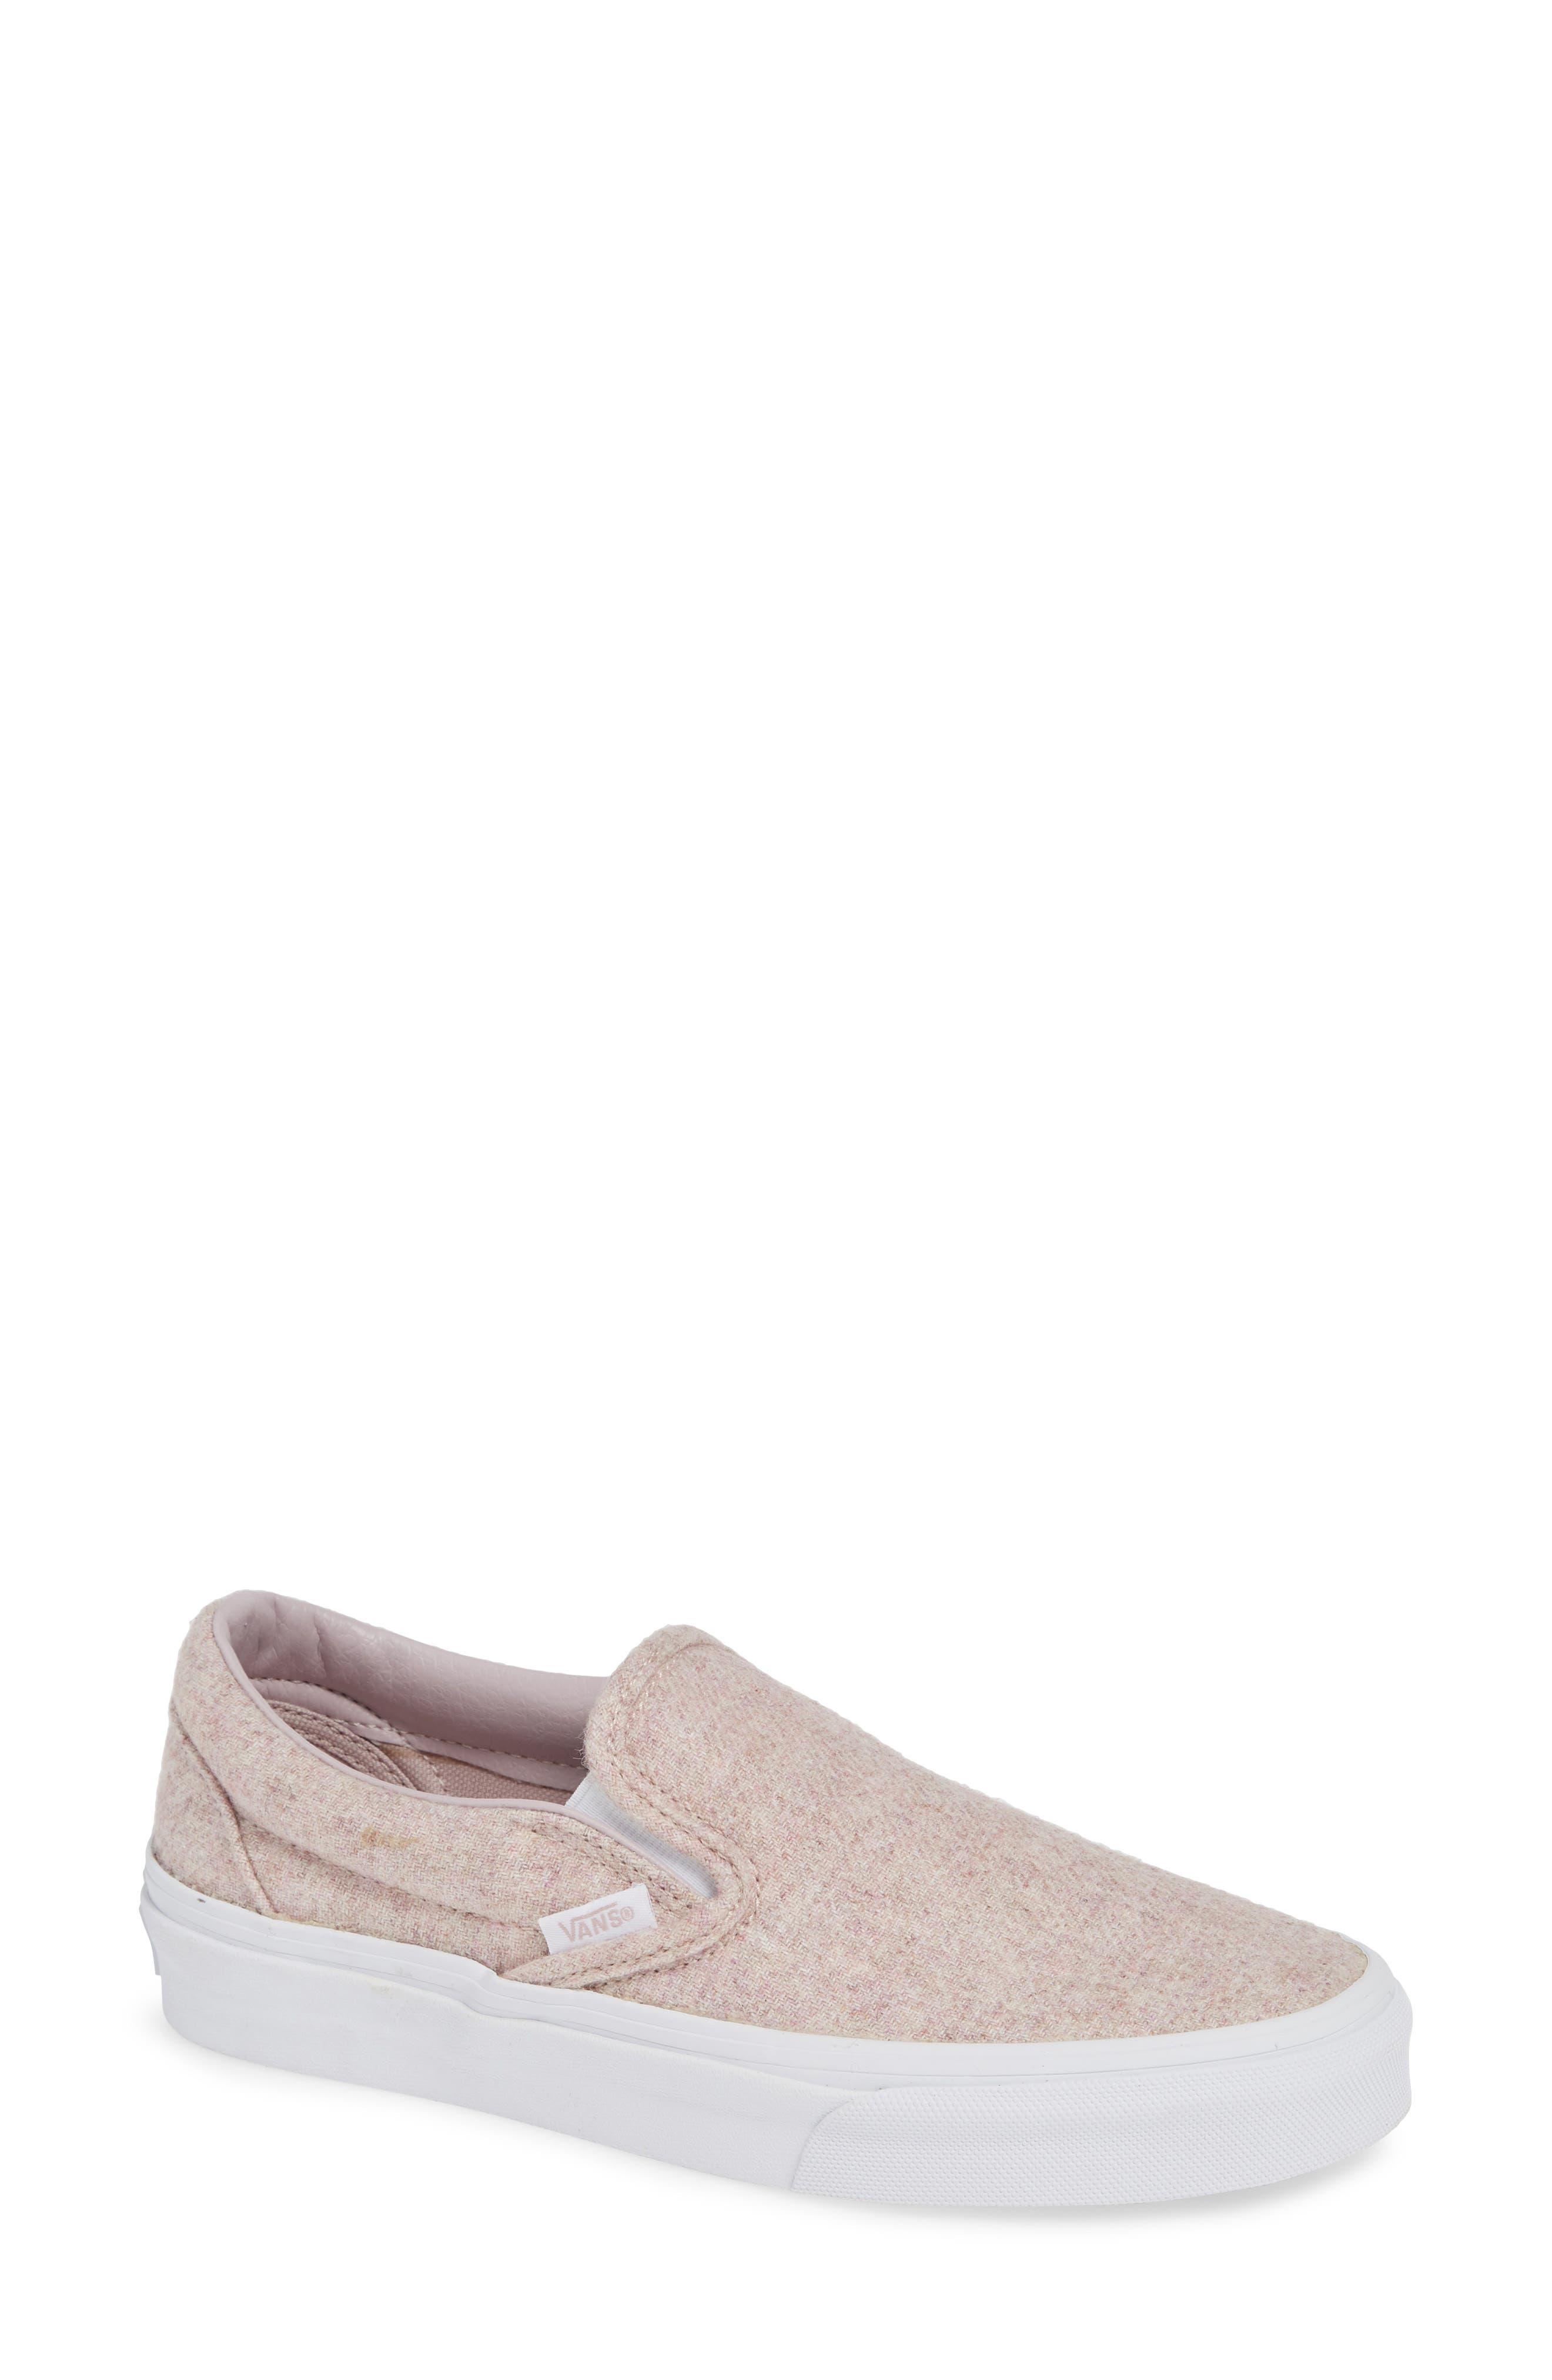 Classic Slip-On Sneaker,                             Main thumbnail 1, color,                             VIOLET ICE/ TRUE WHITE